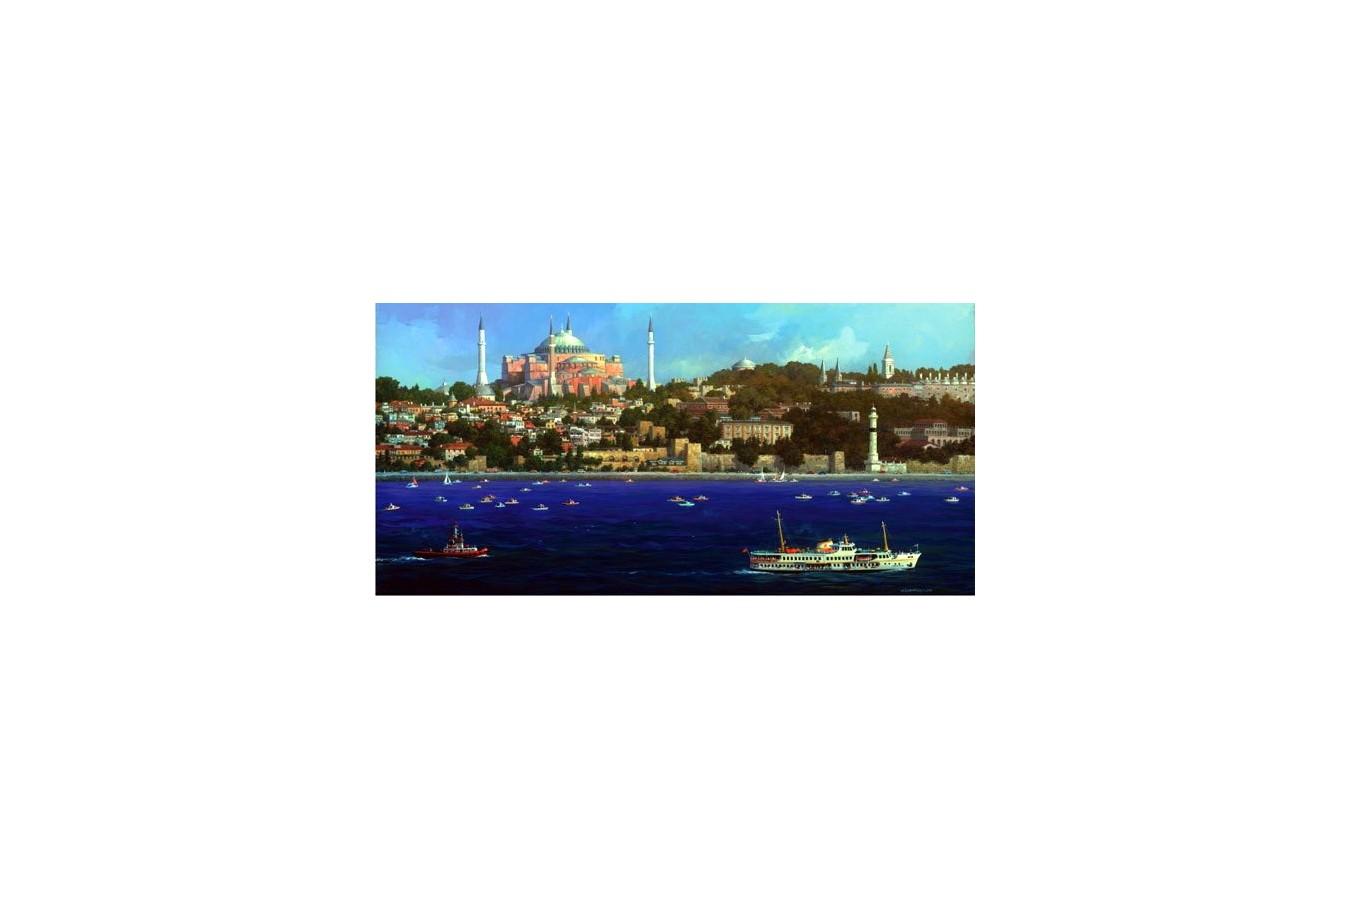 Puzzle Anatolian - Ayasofya, 1500 piese, panoramic (3768)